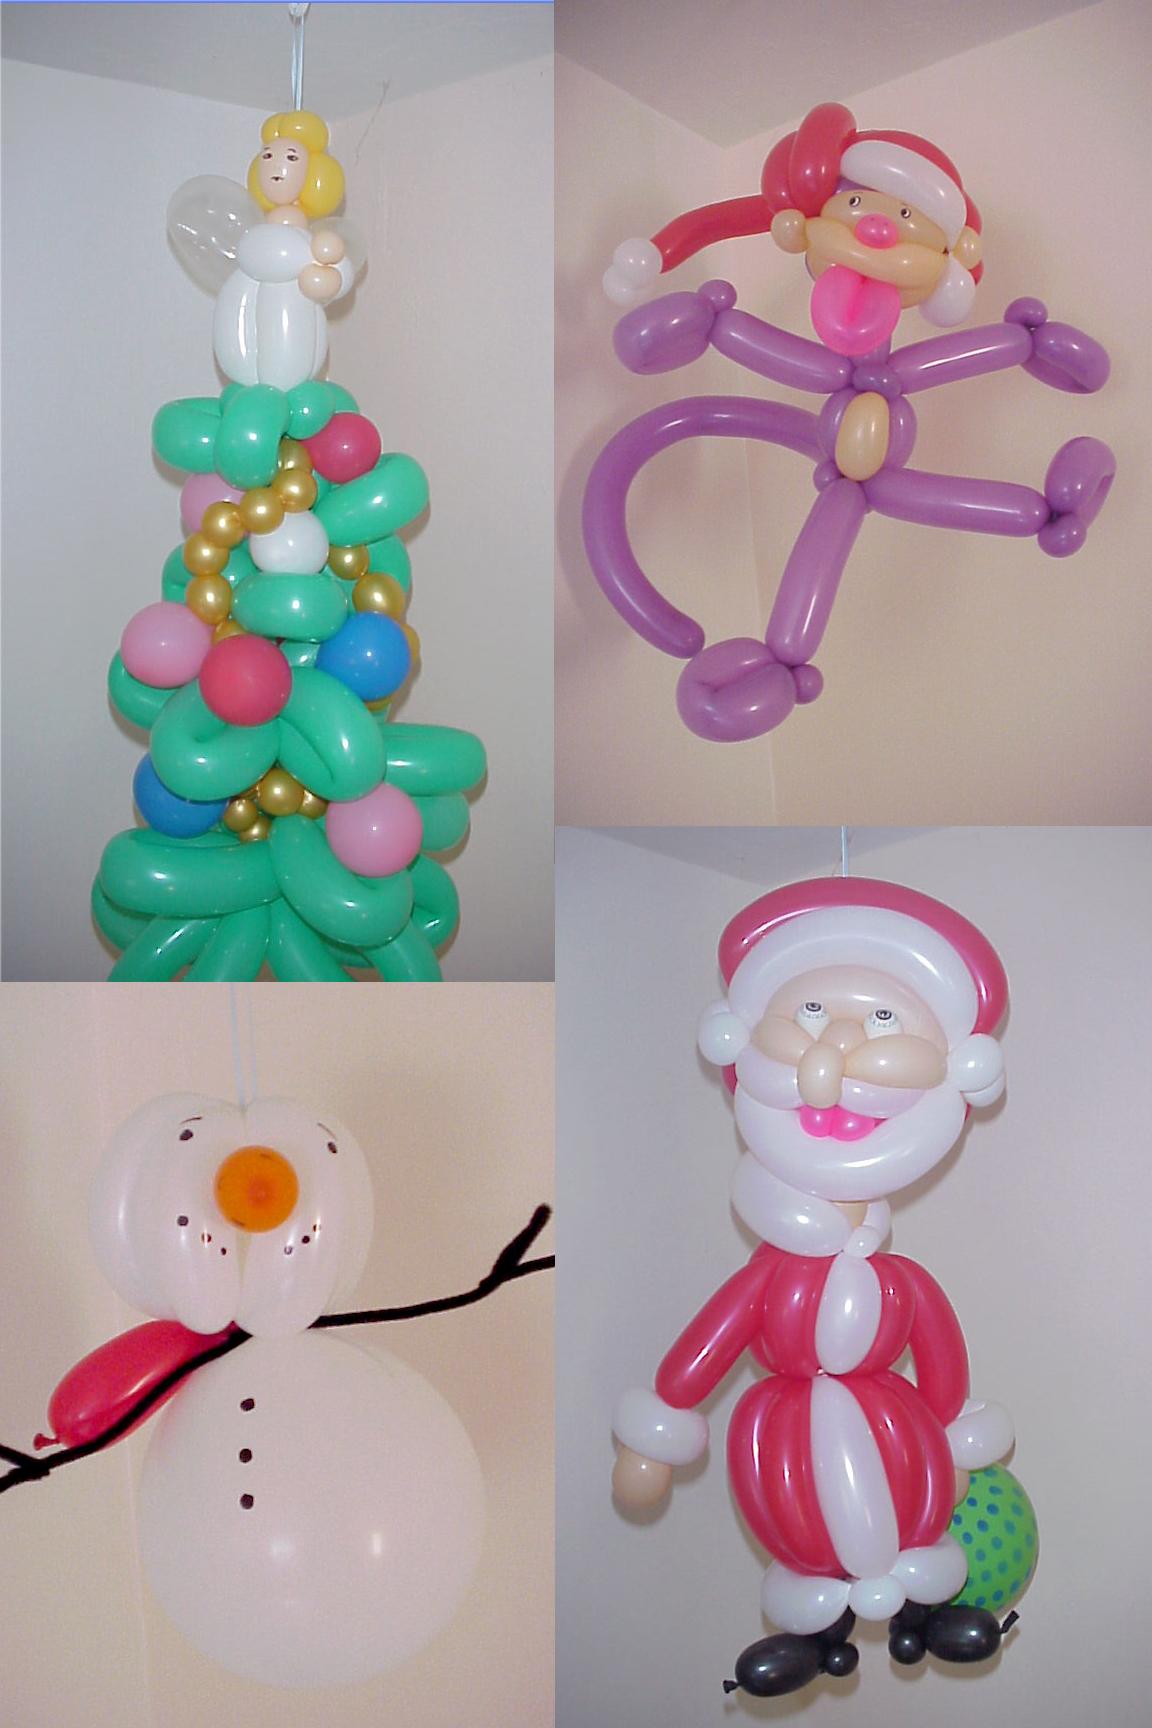 By Irina: Miami Gift Ideas. Balloon Art is a Simple Gift Idea ...